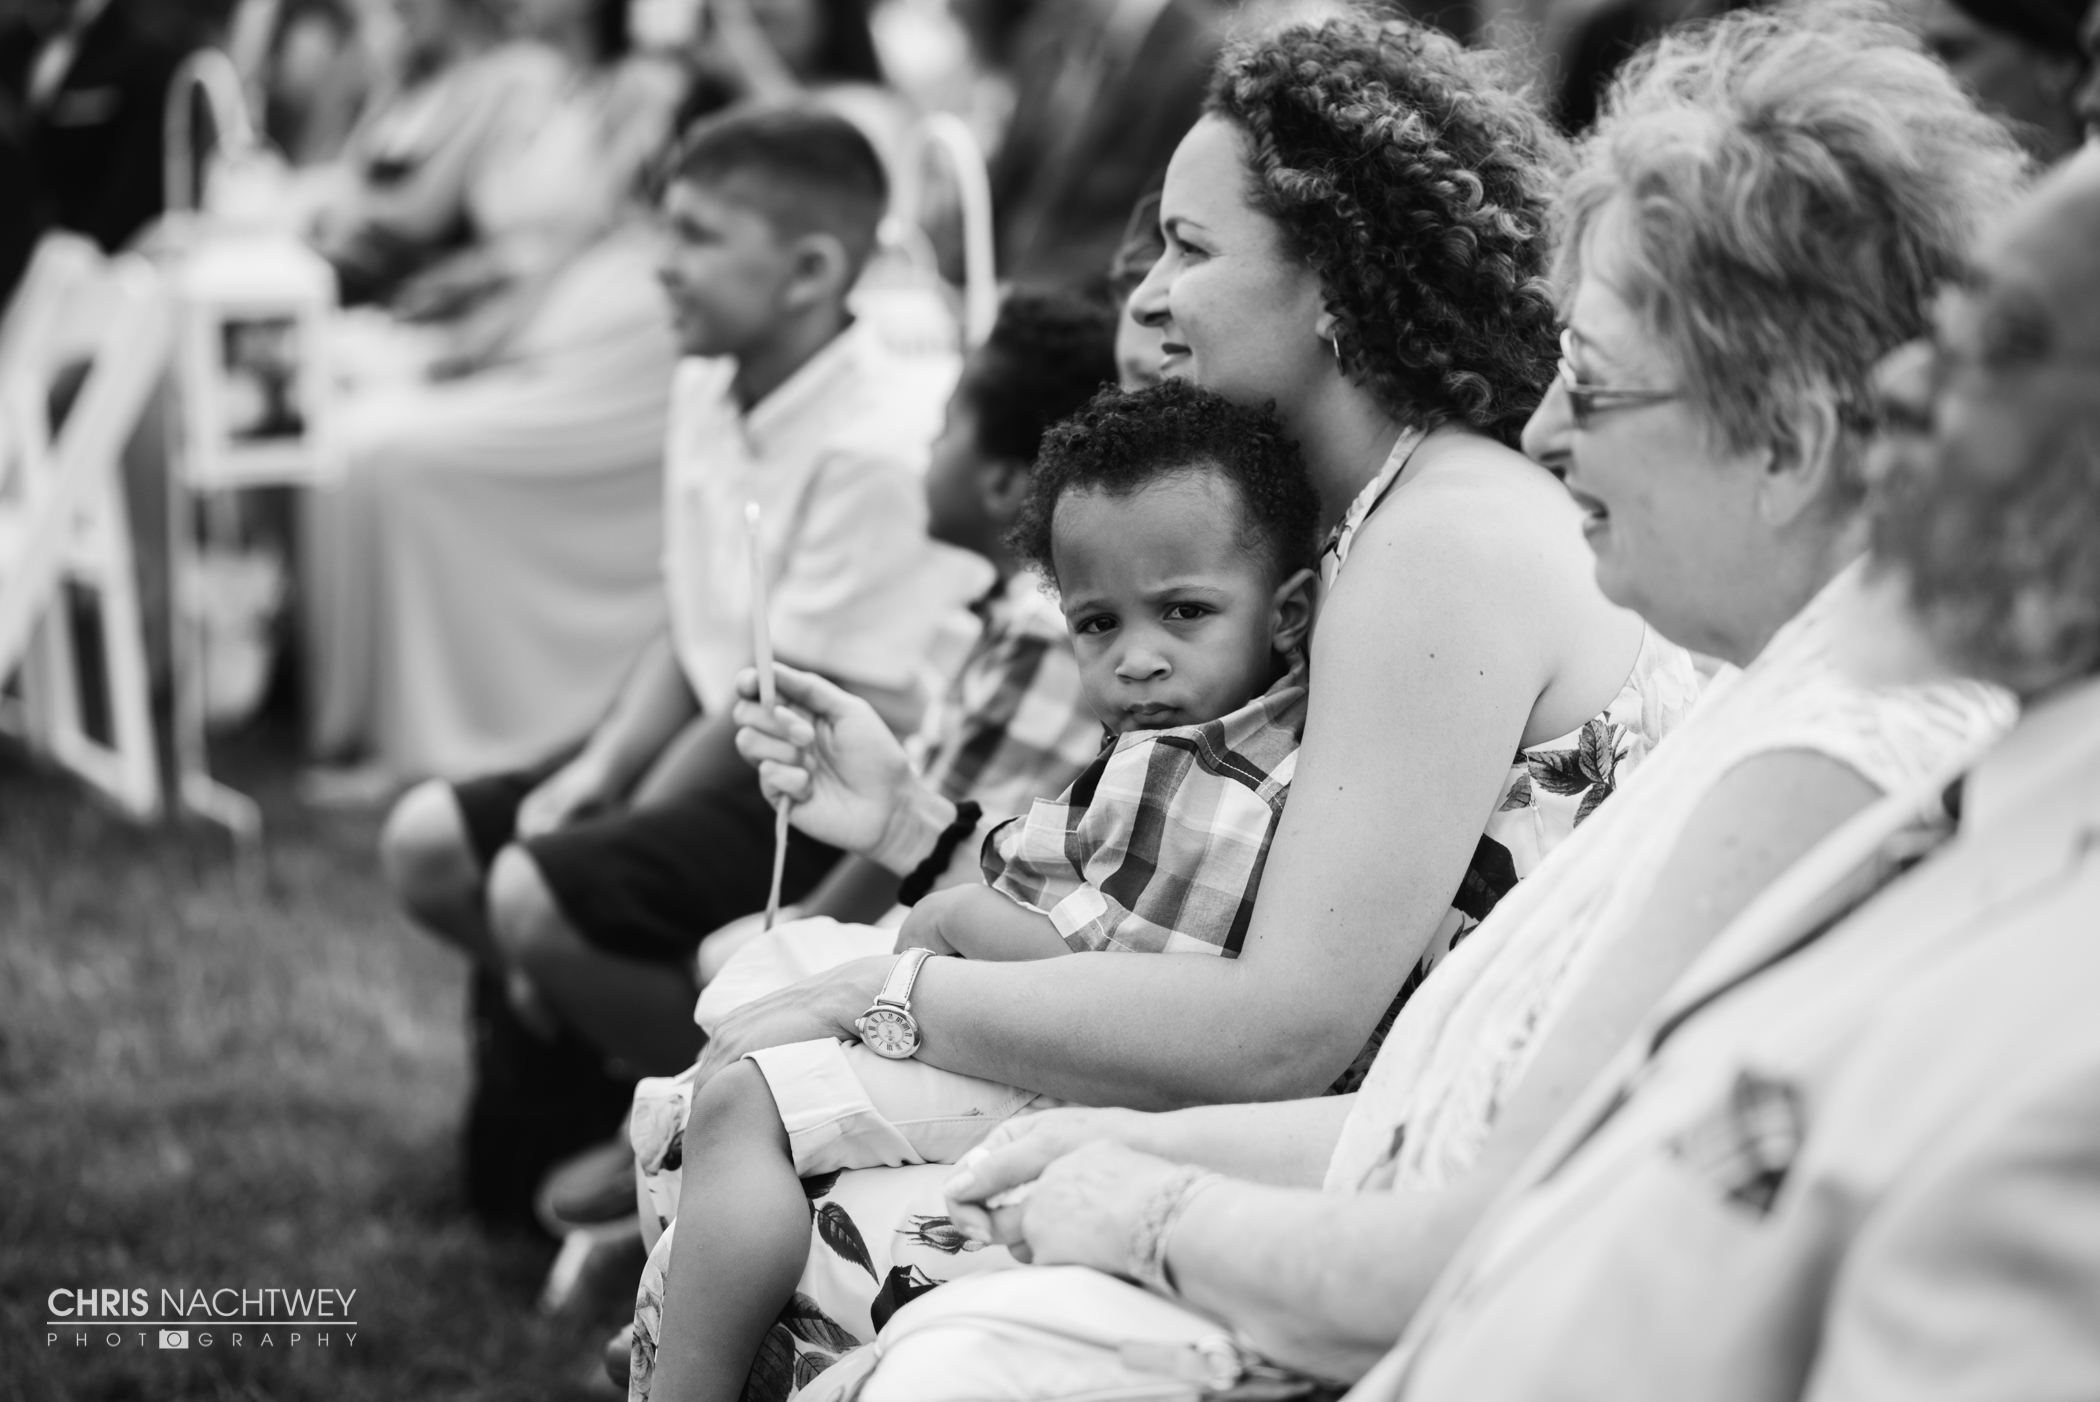 wedding-saltwater-farm-vineyard-photos-stonington-ct-chris-nachtwey-photography-2016-ana-austin-22.jpg